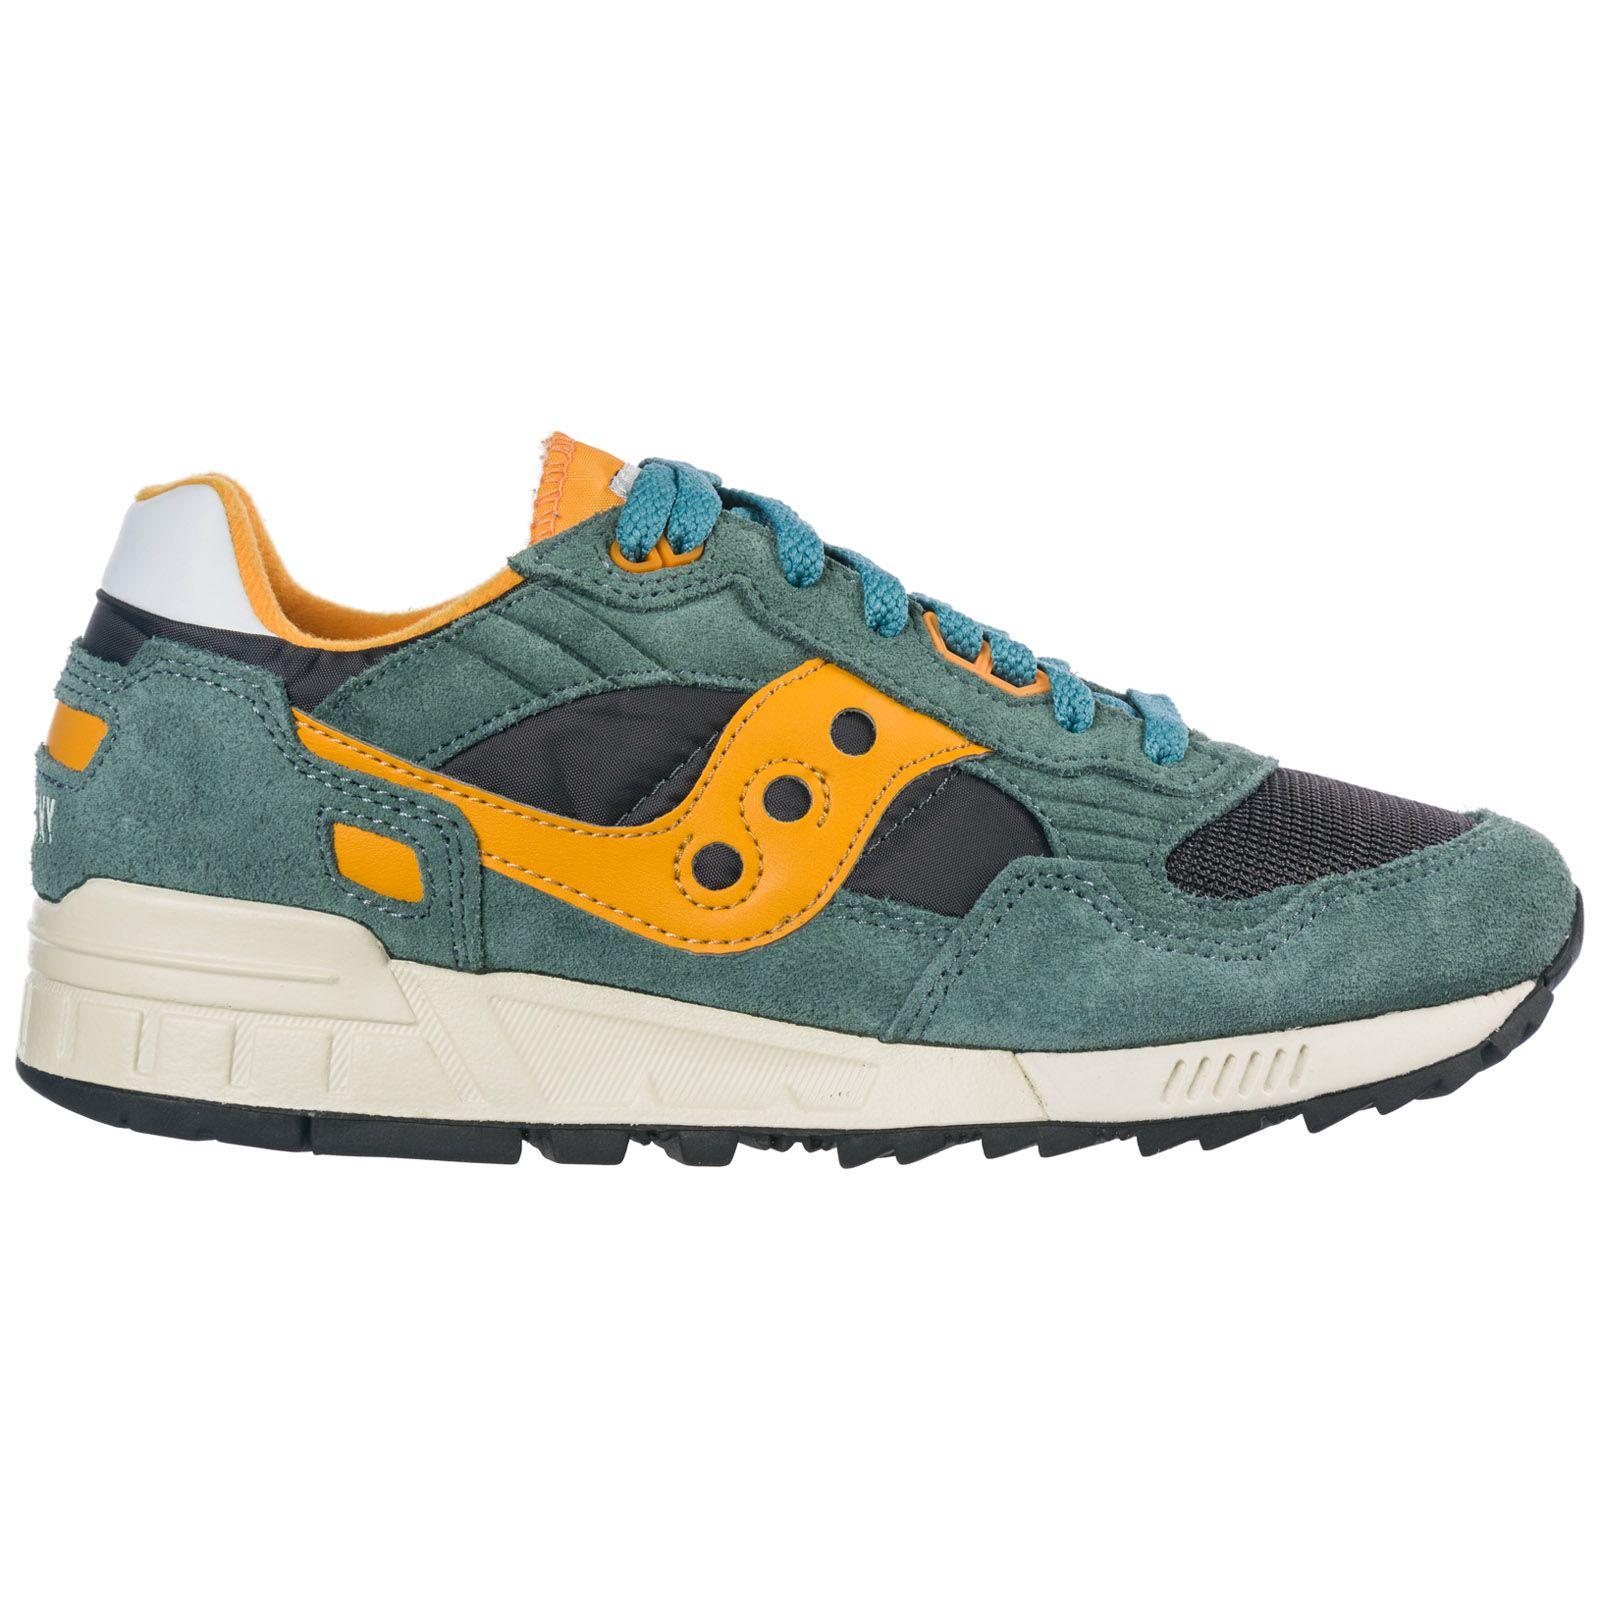 23c7f4236e78 SAUCONY .  saucony  shoes